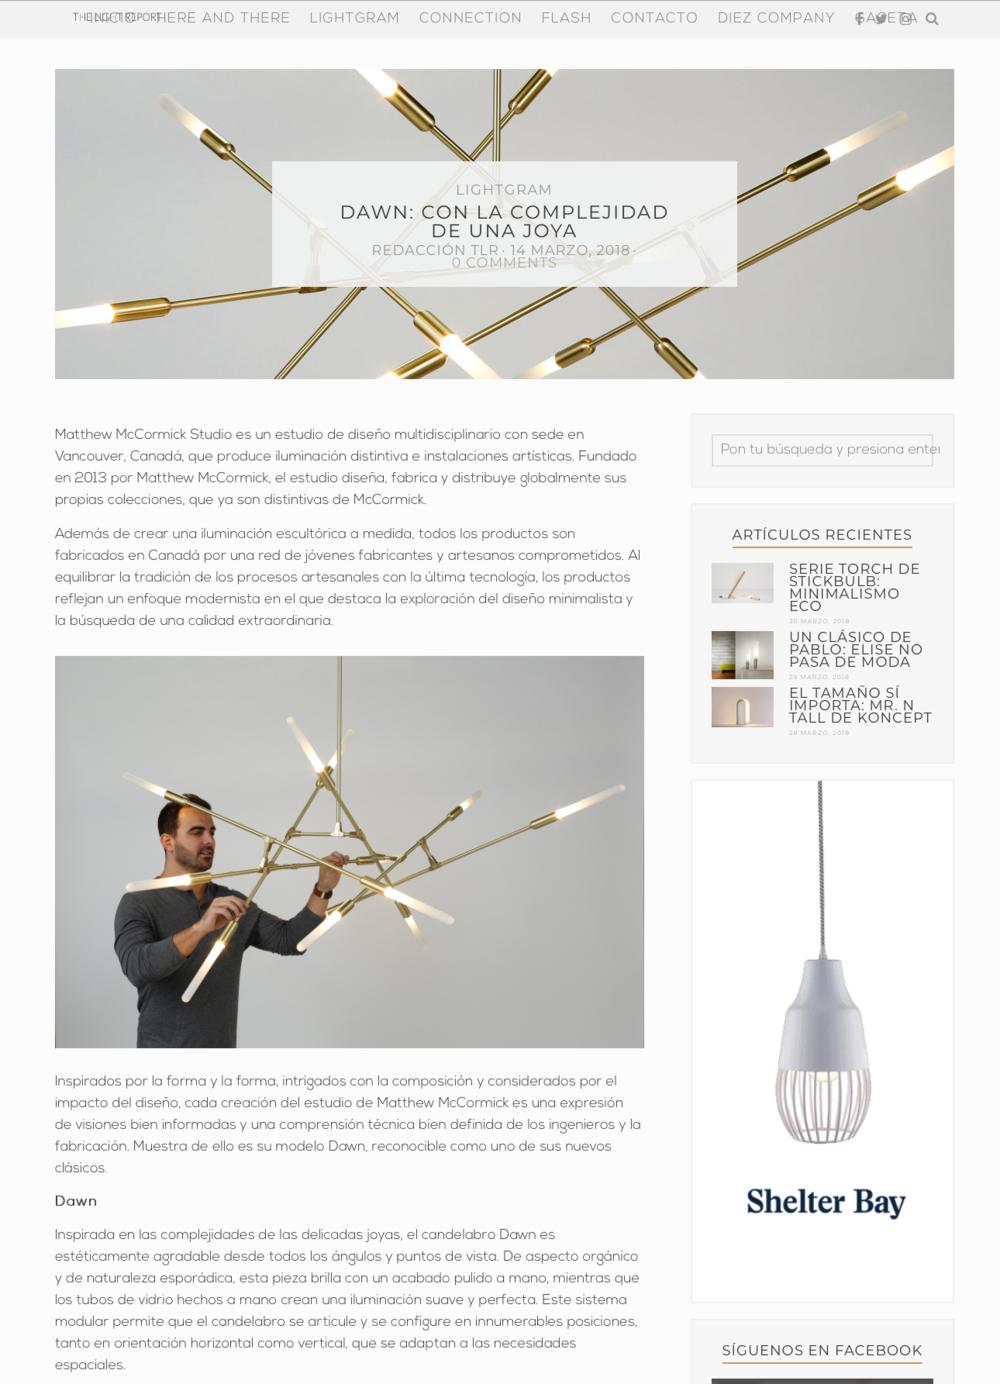 Diez Company - The Lighting Report